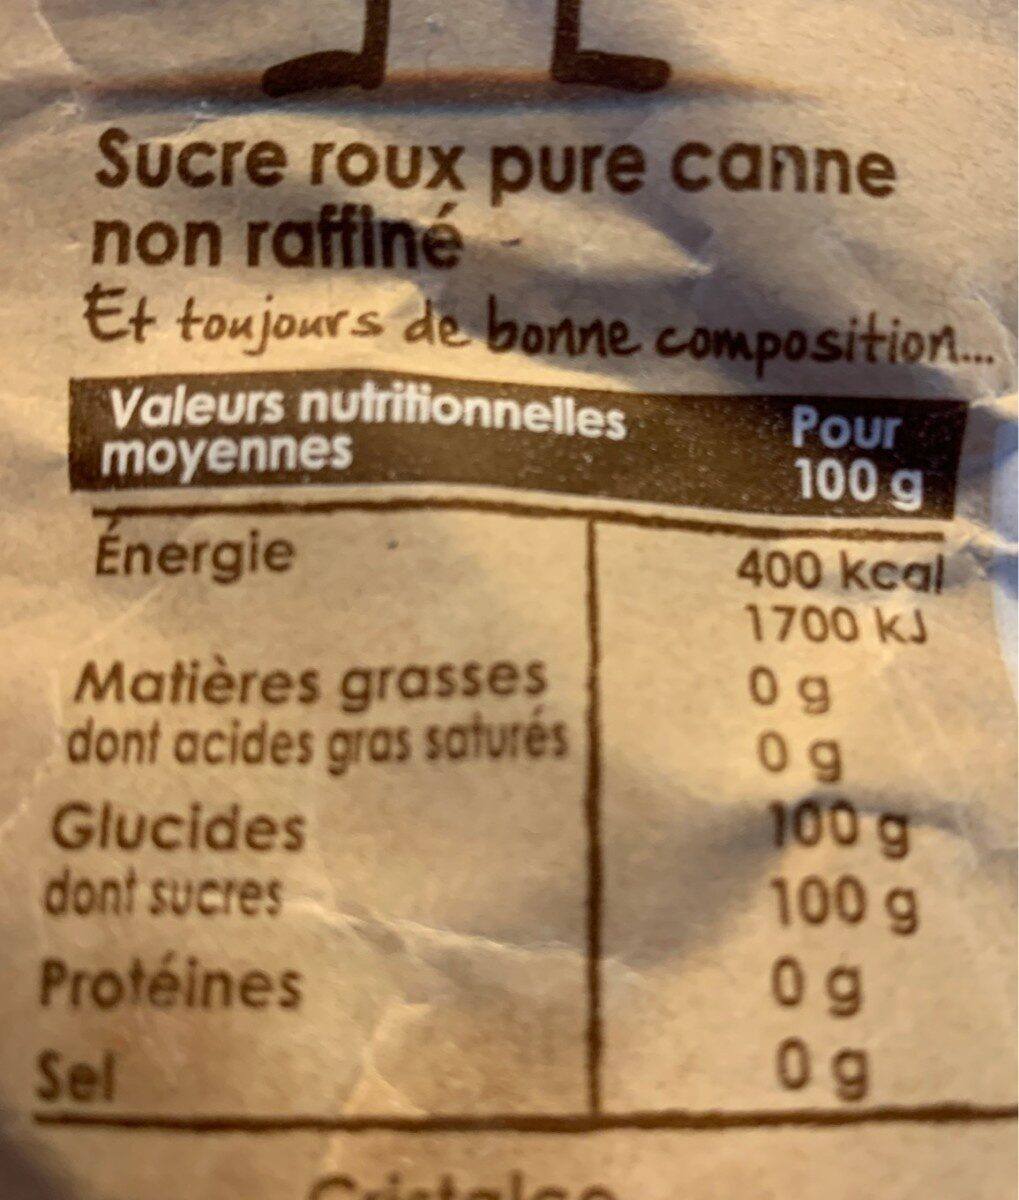 Ppk cassonade pure canne kraft - Nutrition facts - fr